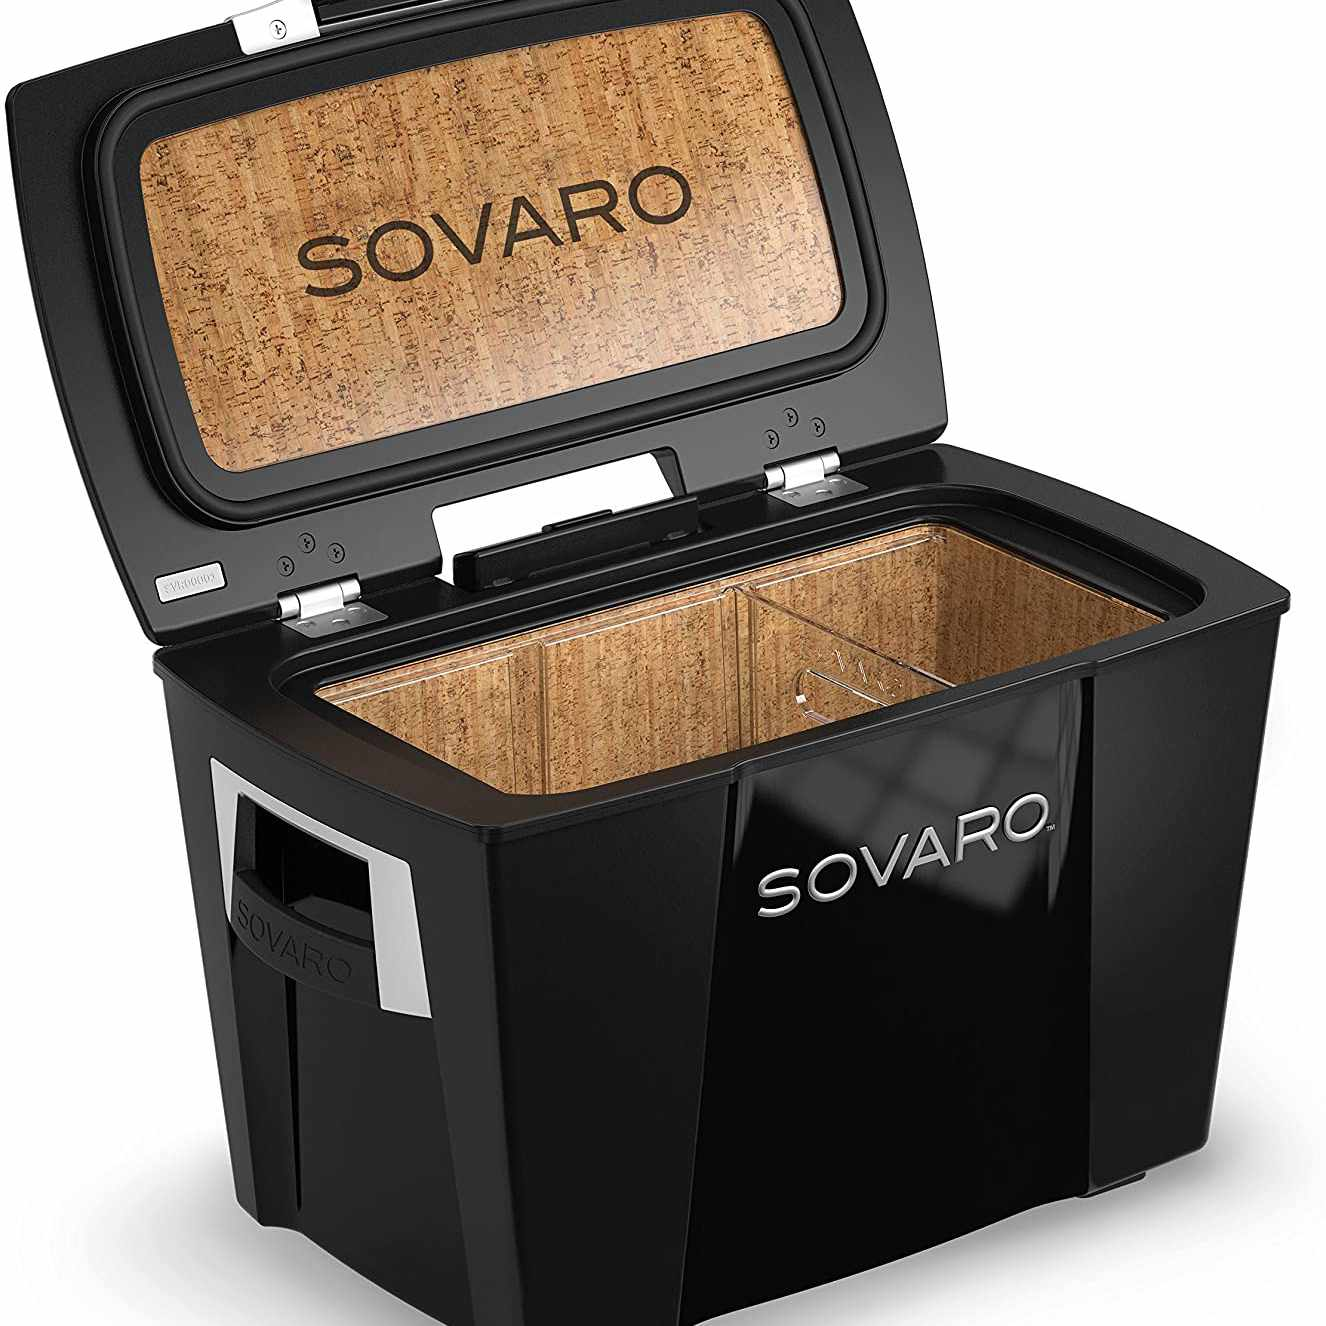 Sovaro 45 Quart Luxury Wine/Spirit Cooler,